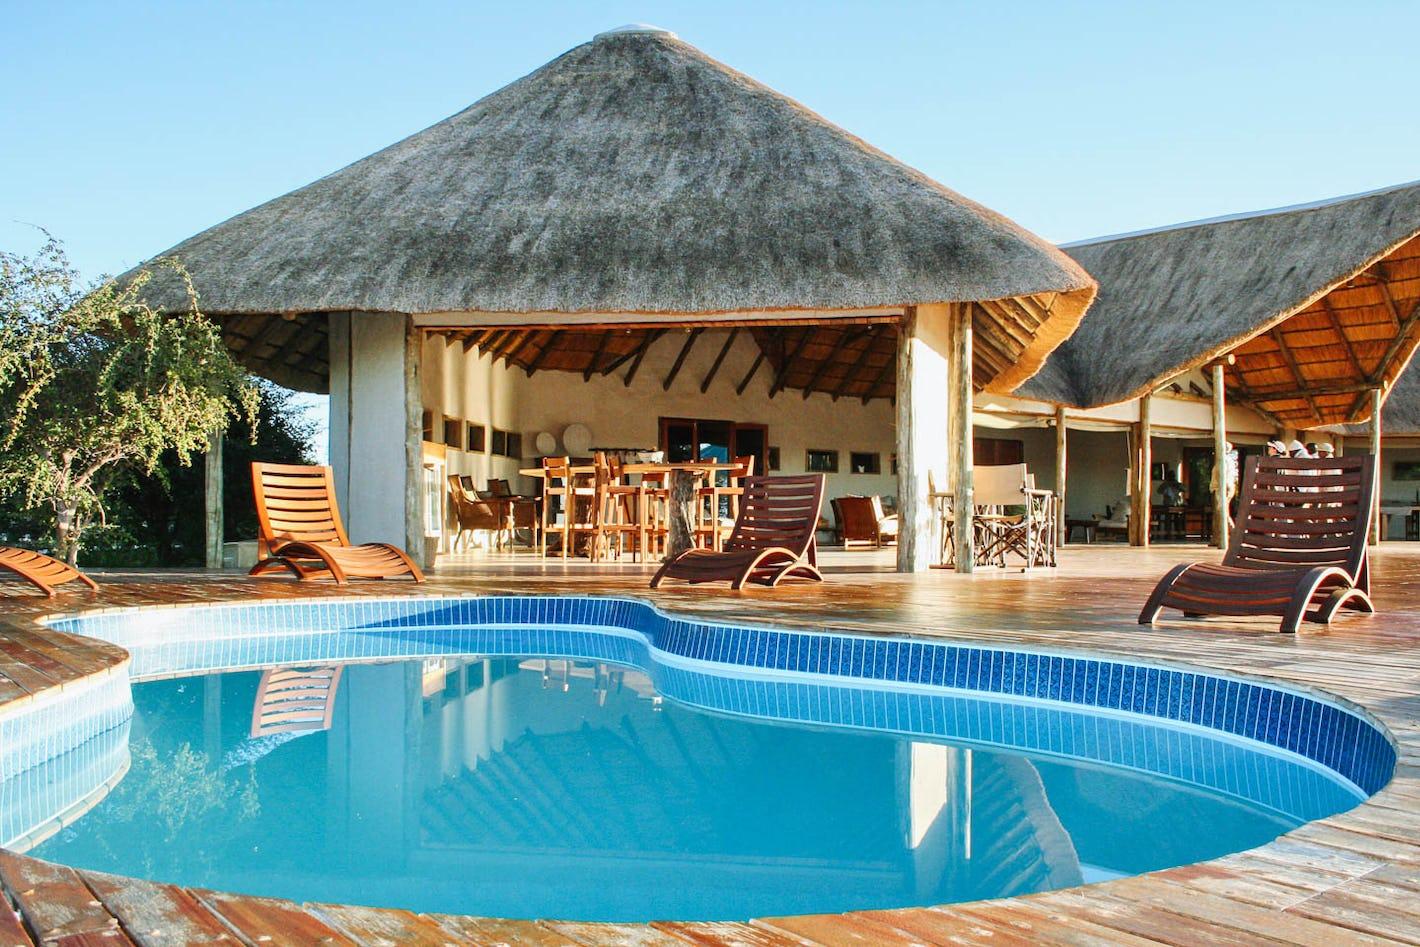 Design your makgadikgadi safari online timbuktu travel for Pool designs under 50 000